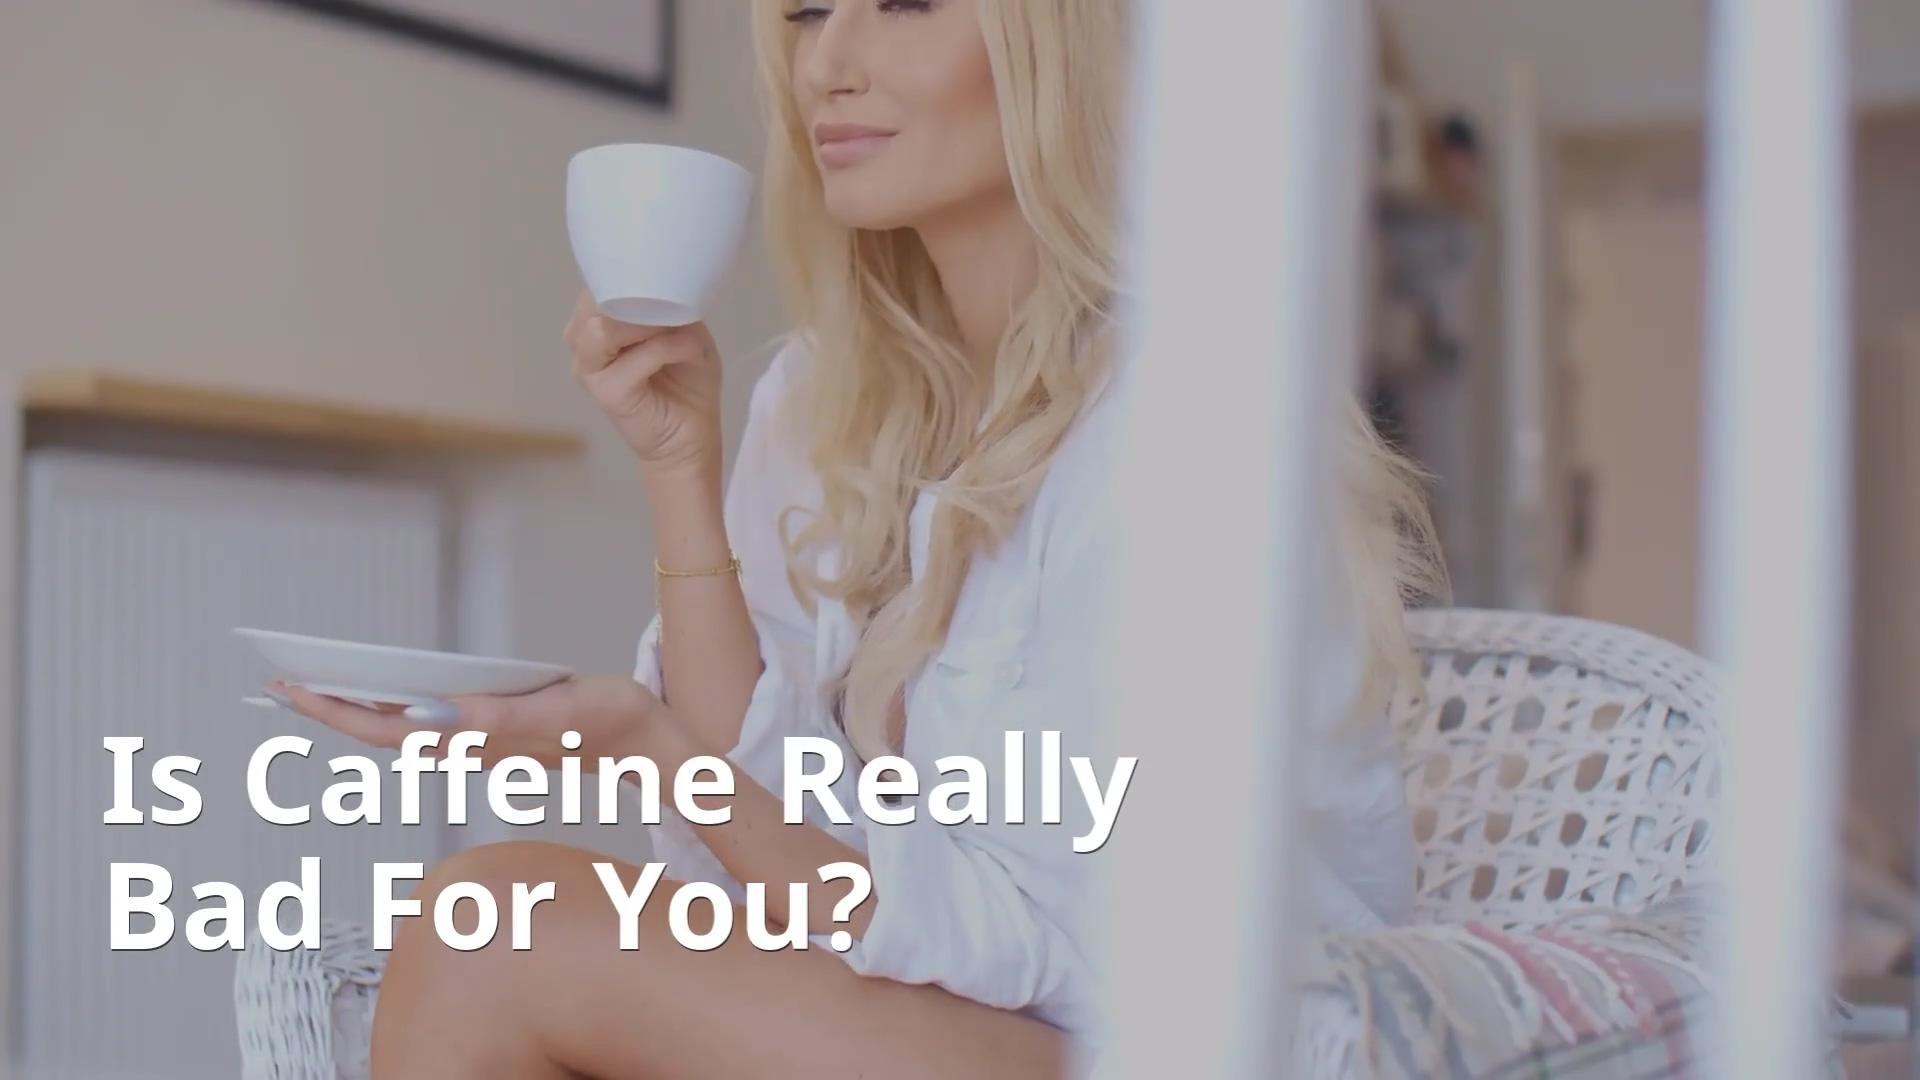 caffeine-gene(matrix)